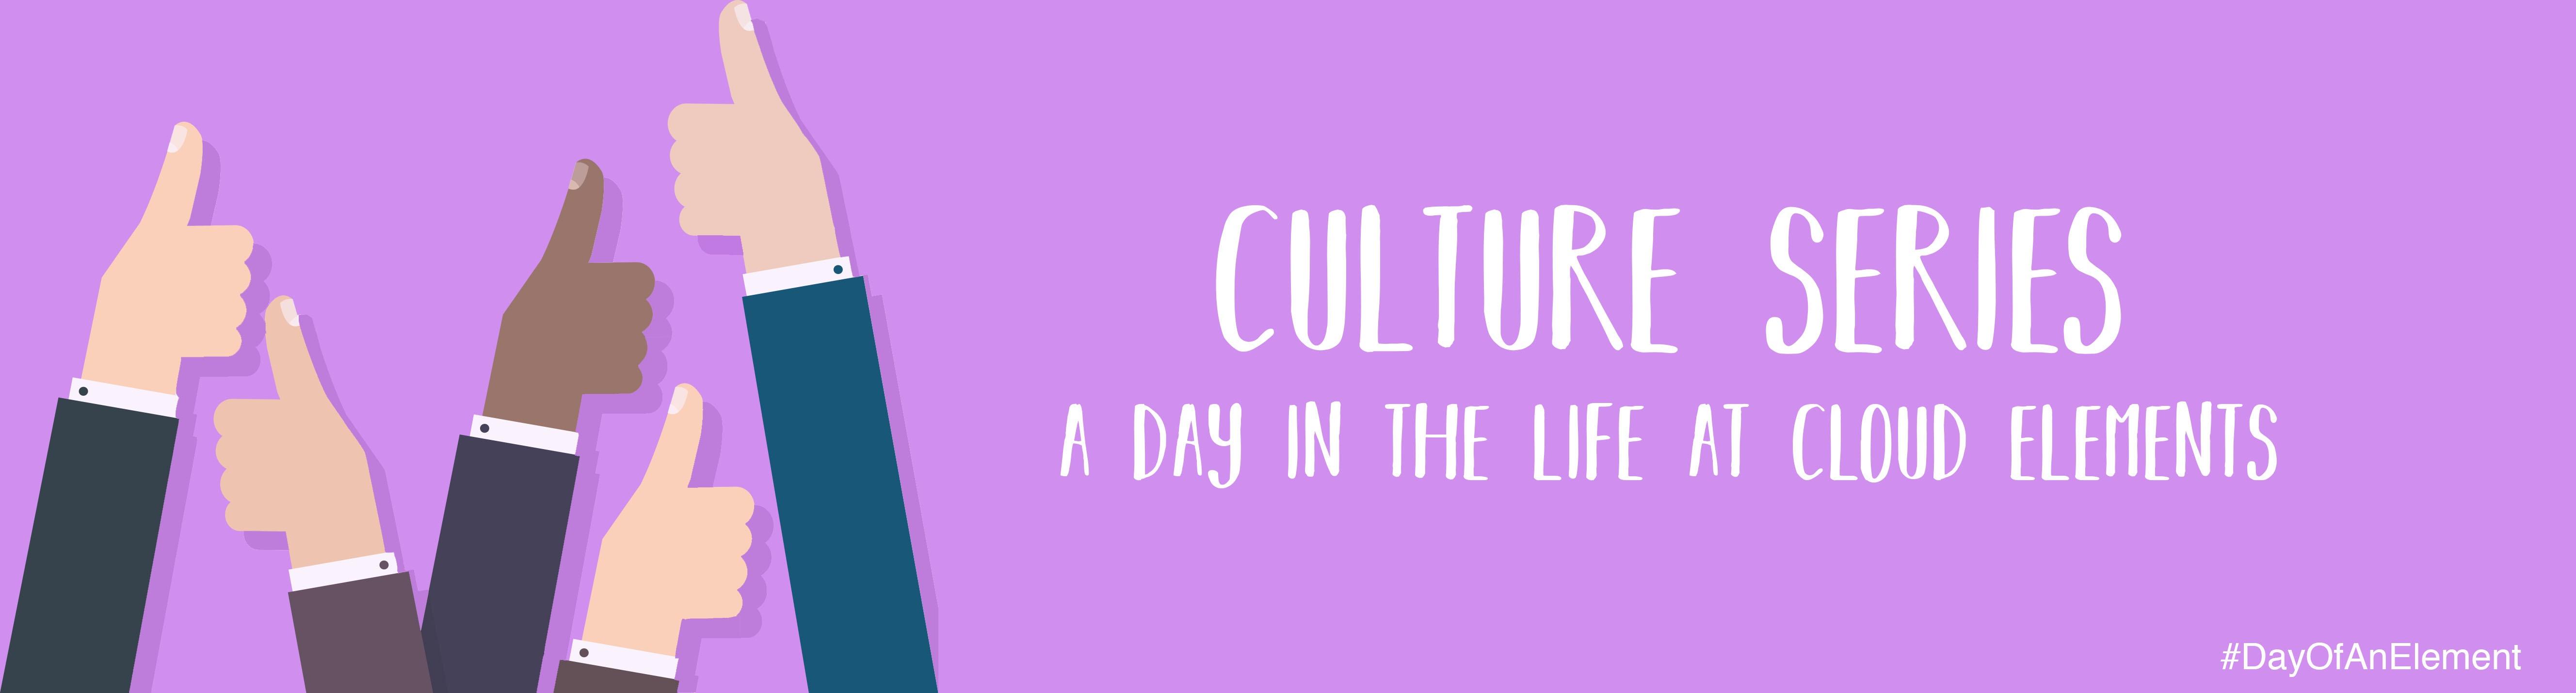 CultureSeriesBlog-Cayla-1.jpg